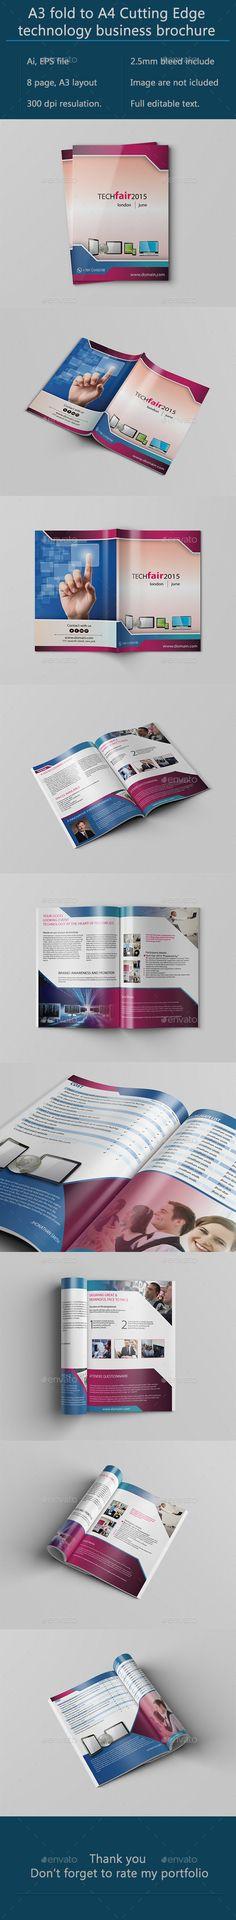 Creative Bathroom Catalog Template Brochures, Brochure template - technology brochure template